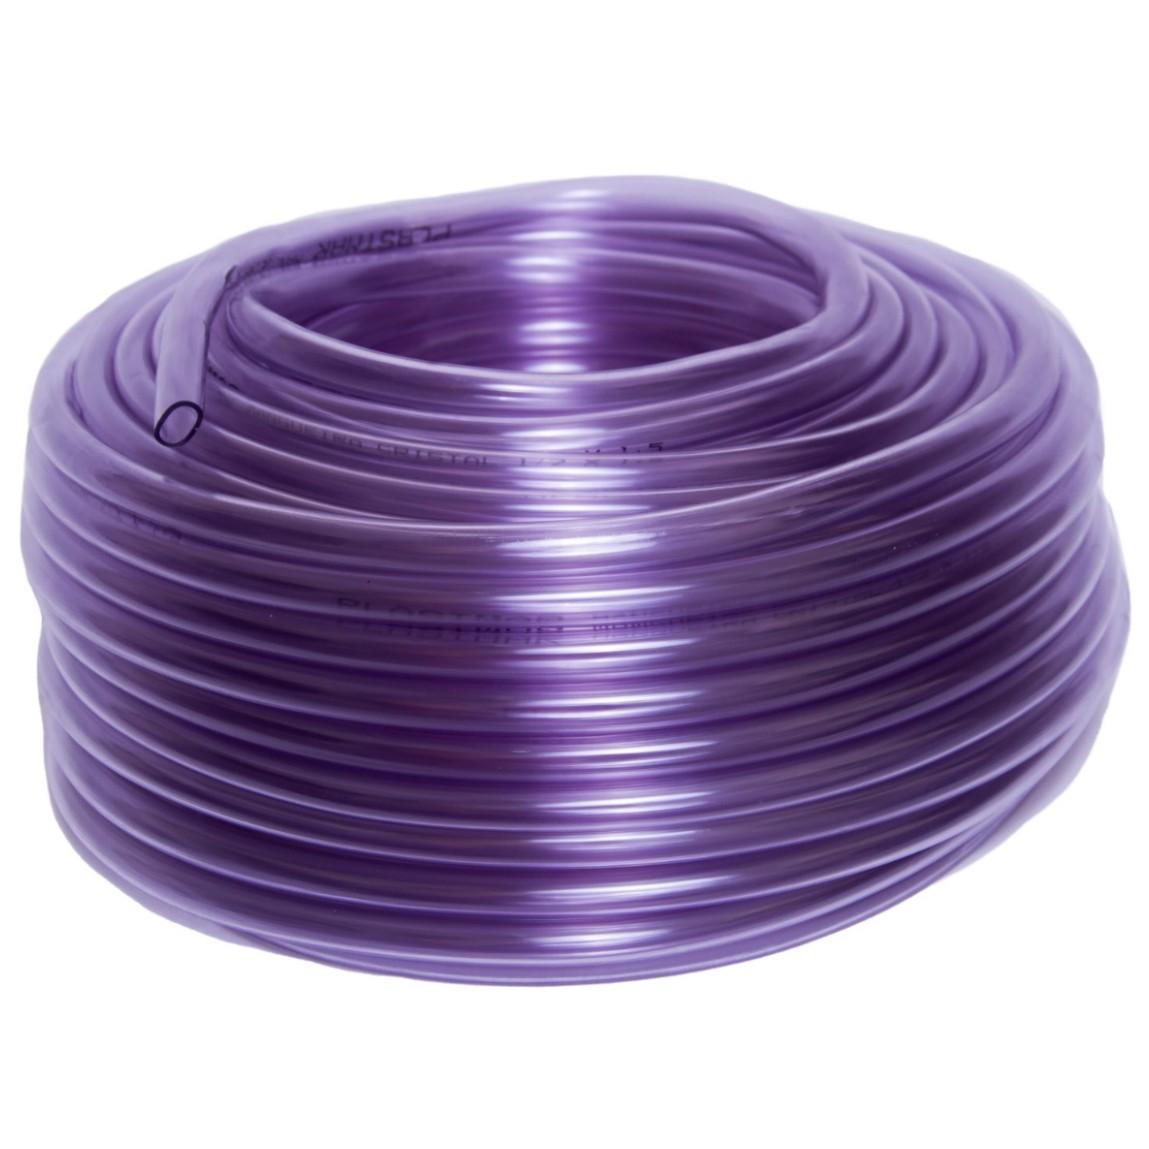 Mangueira de PVC 30m 14 Roxa 2462 - Plastmar